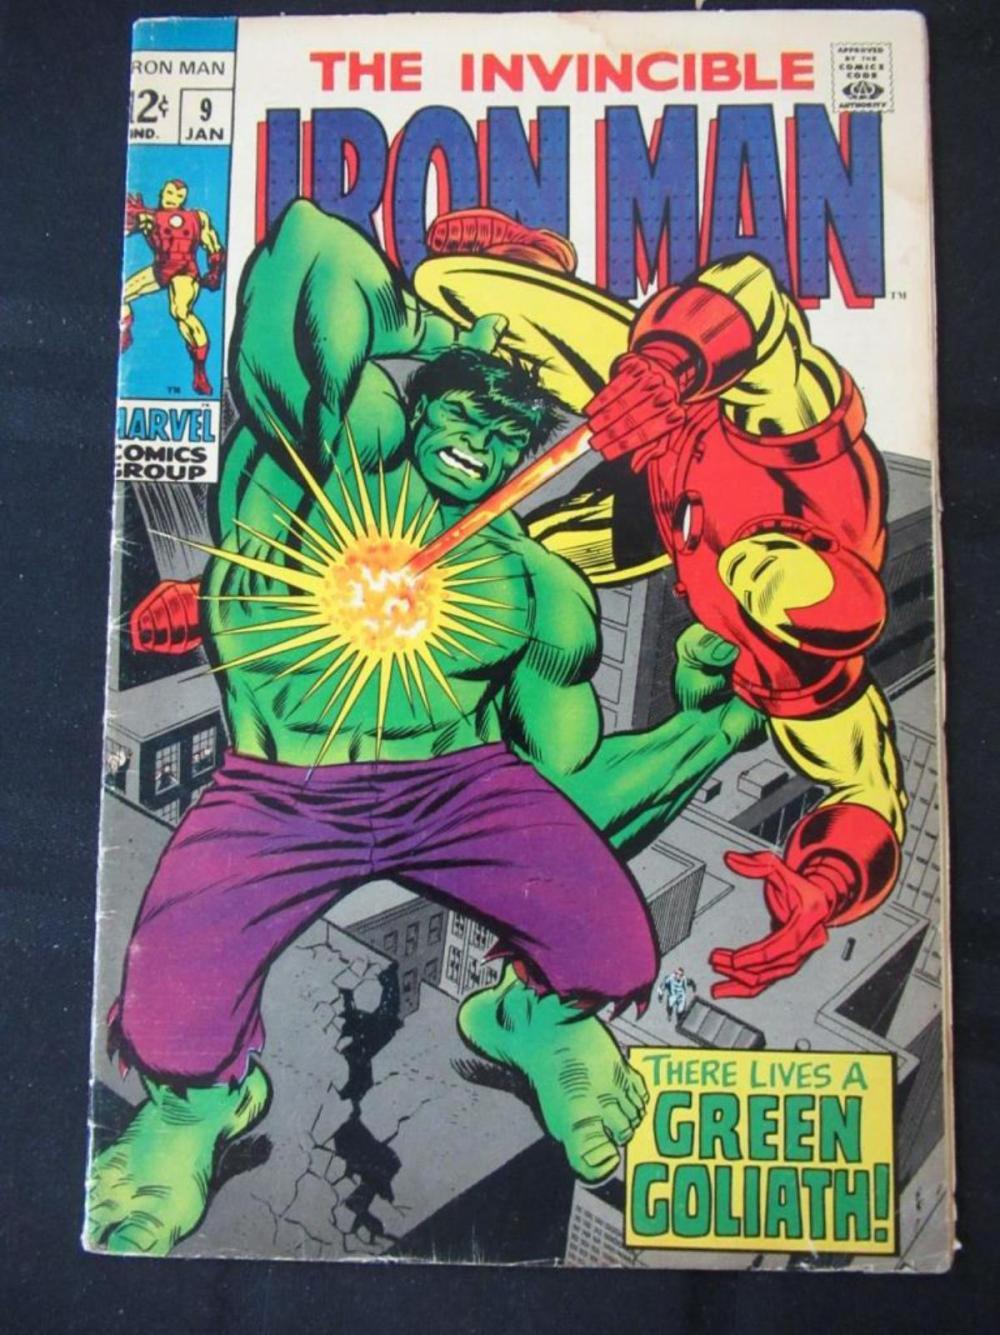 The Invincible Iron Man 12 #9 The Green Goliath